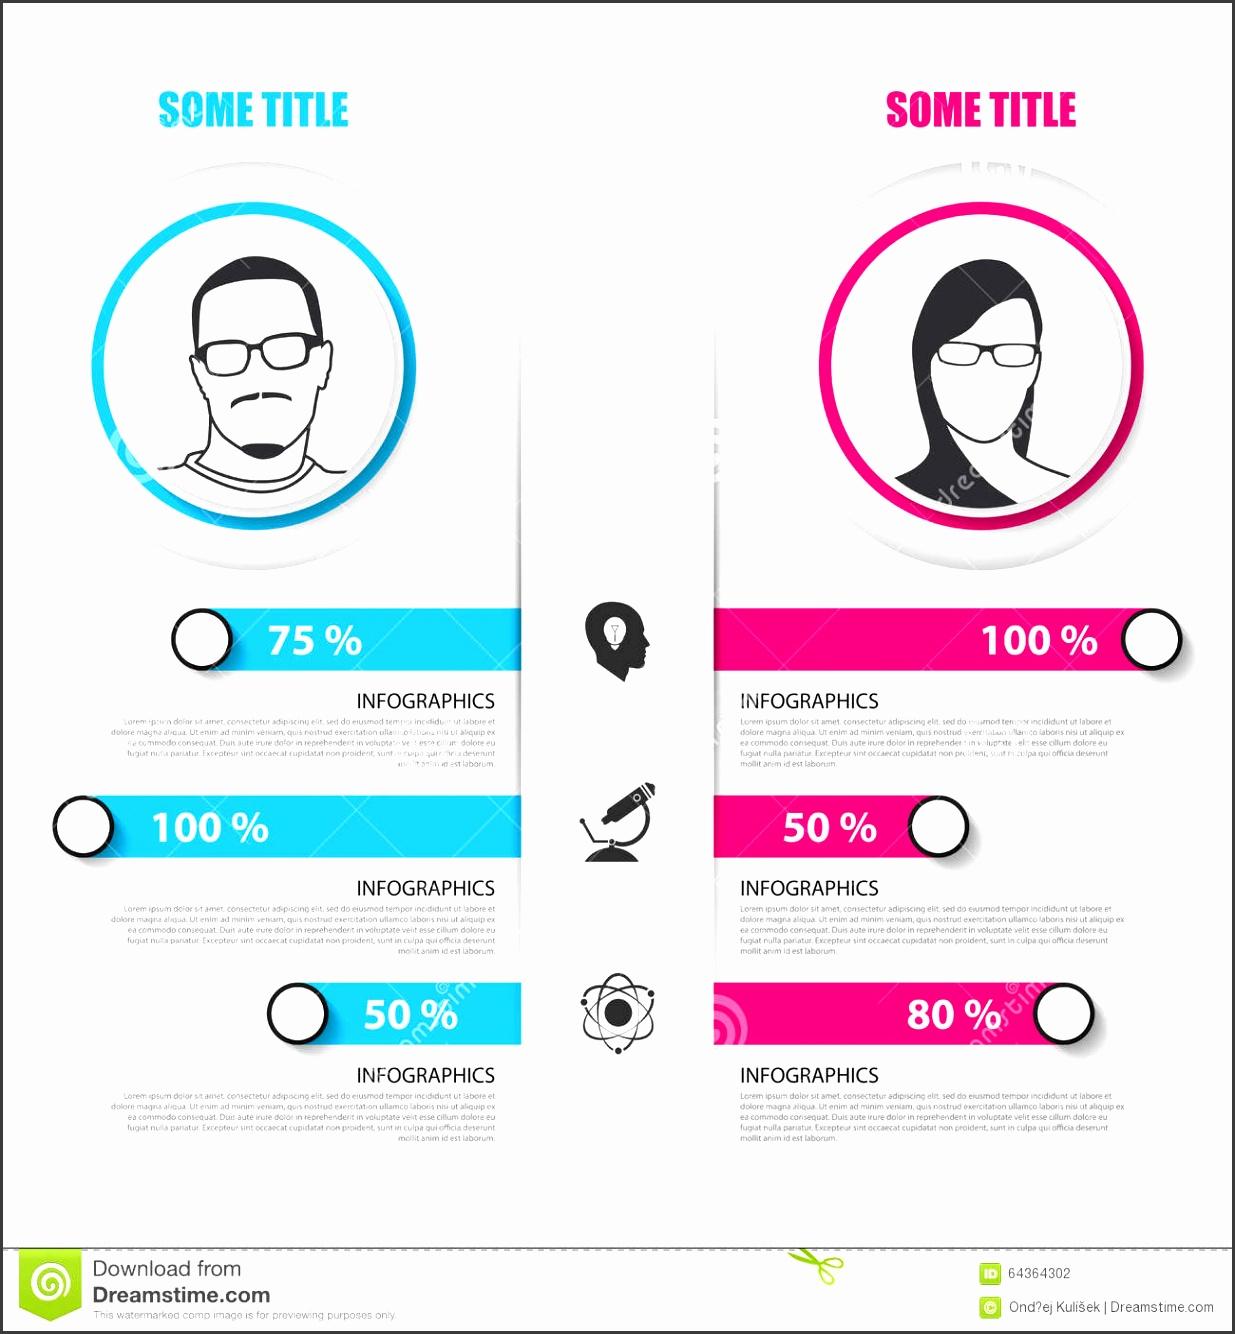 Organization chart infographics design template Vector illustration